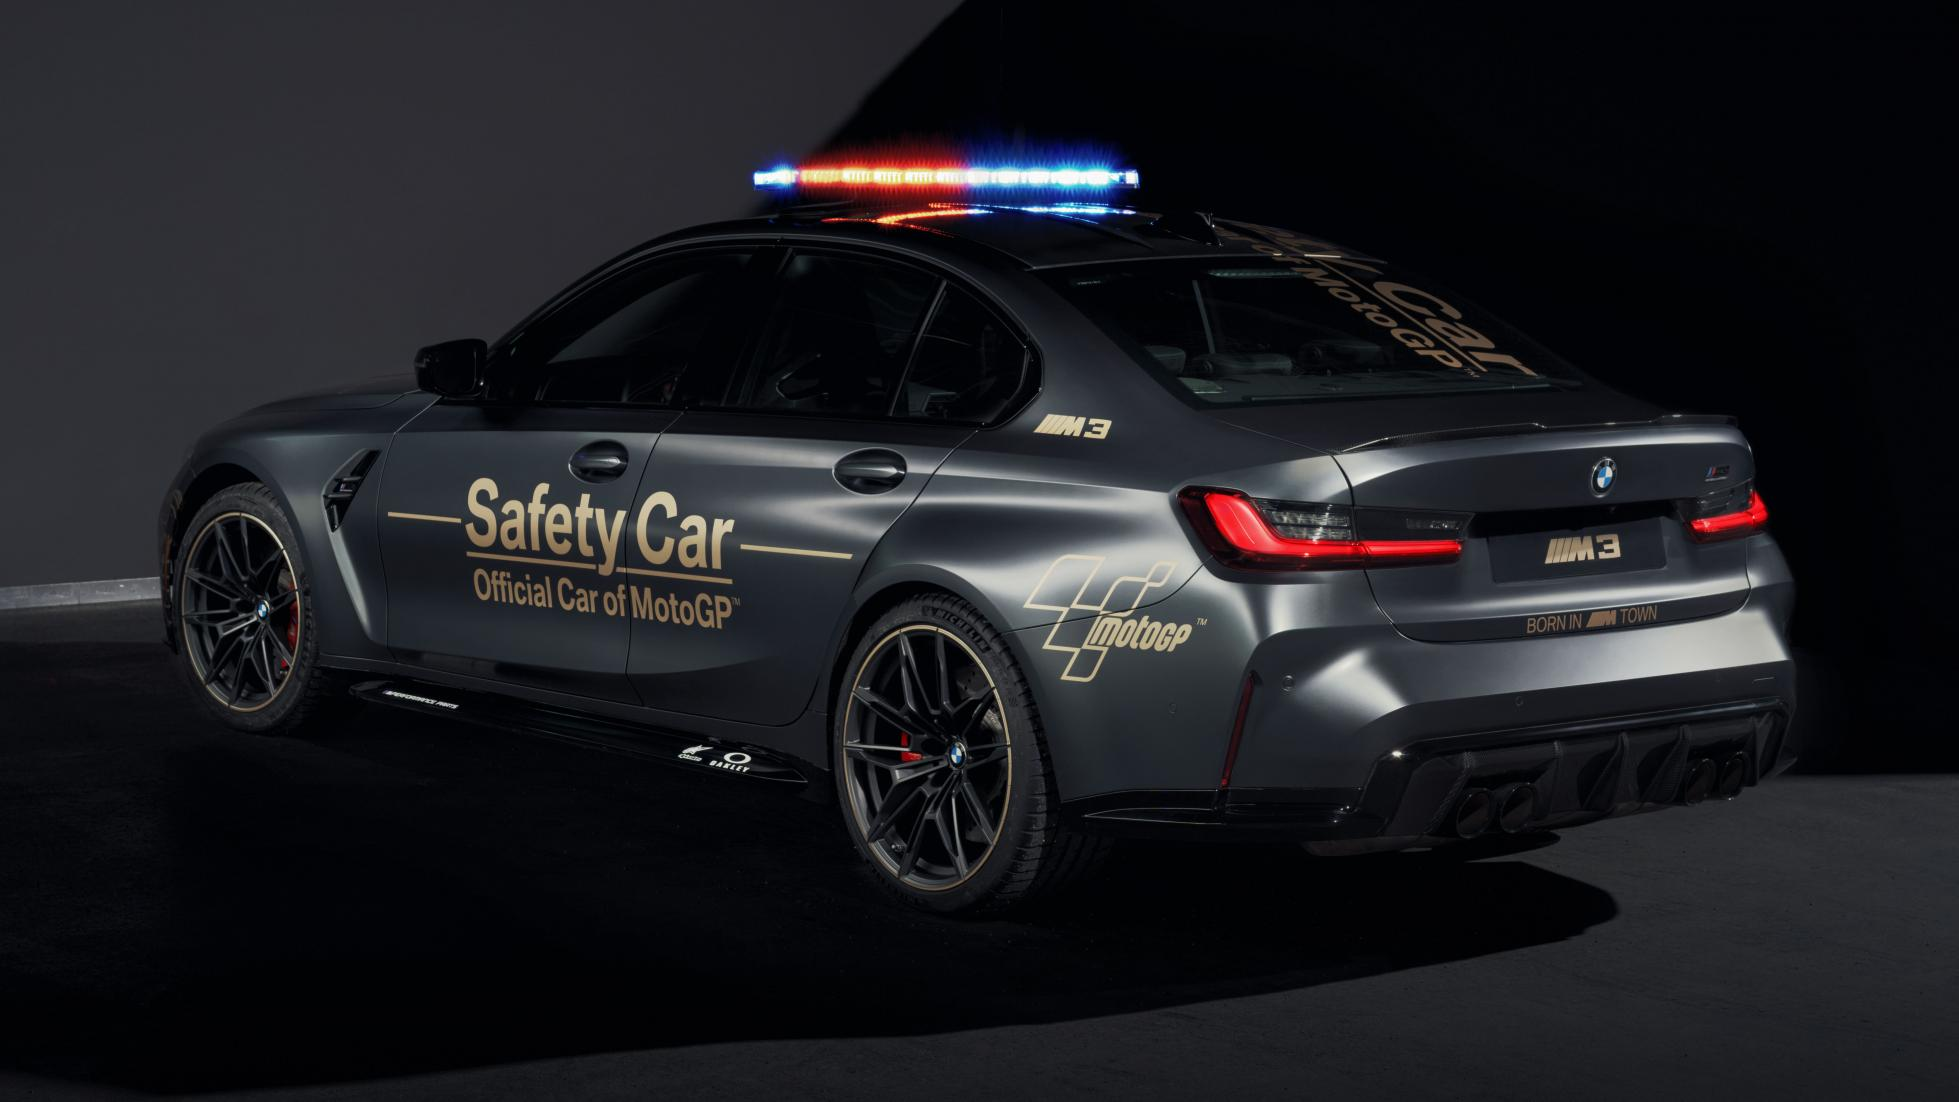 The BMW M3 as a MotoGP safety car, rear alternative angle